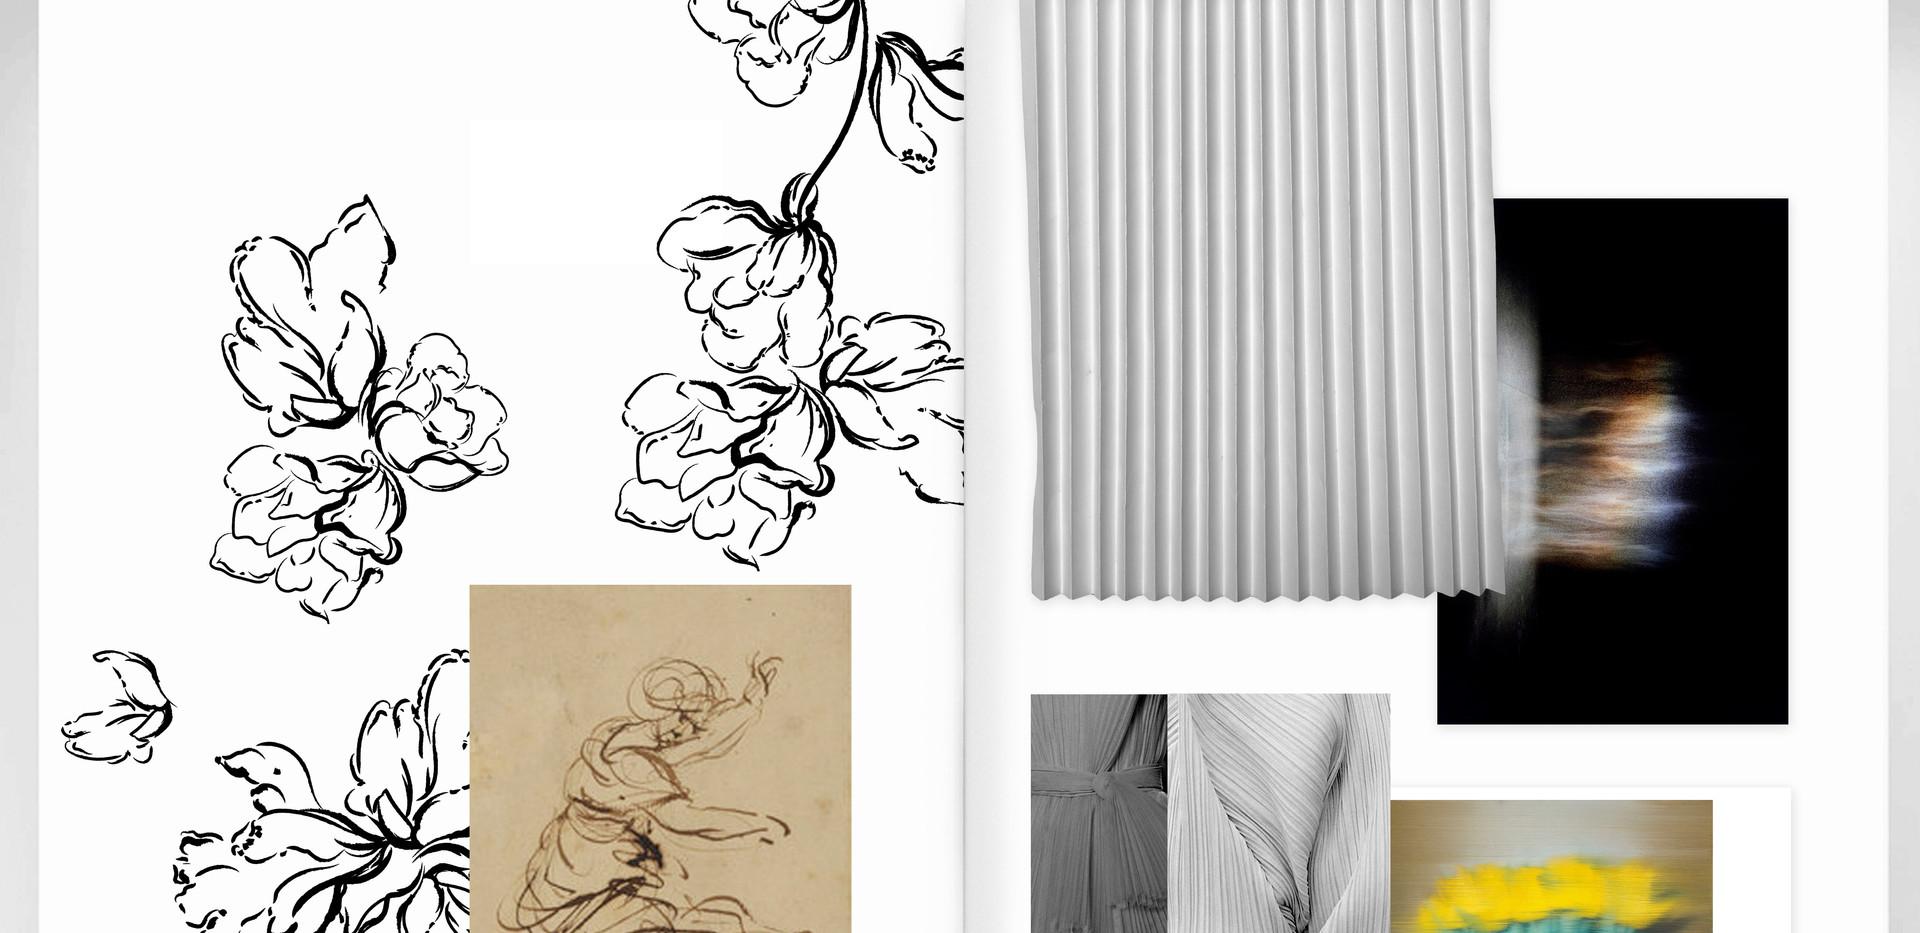 DESIGN 5Artboard 1.jpg